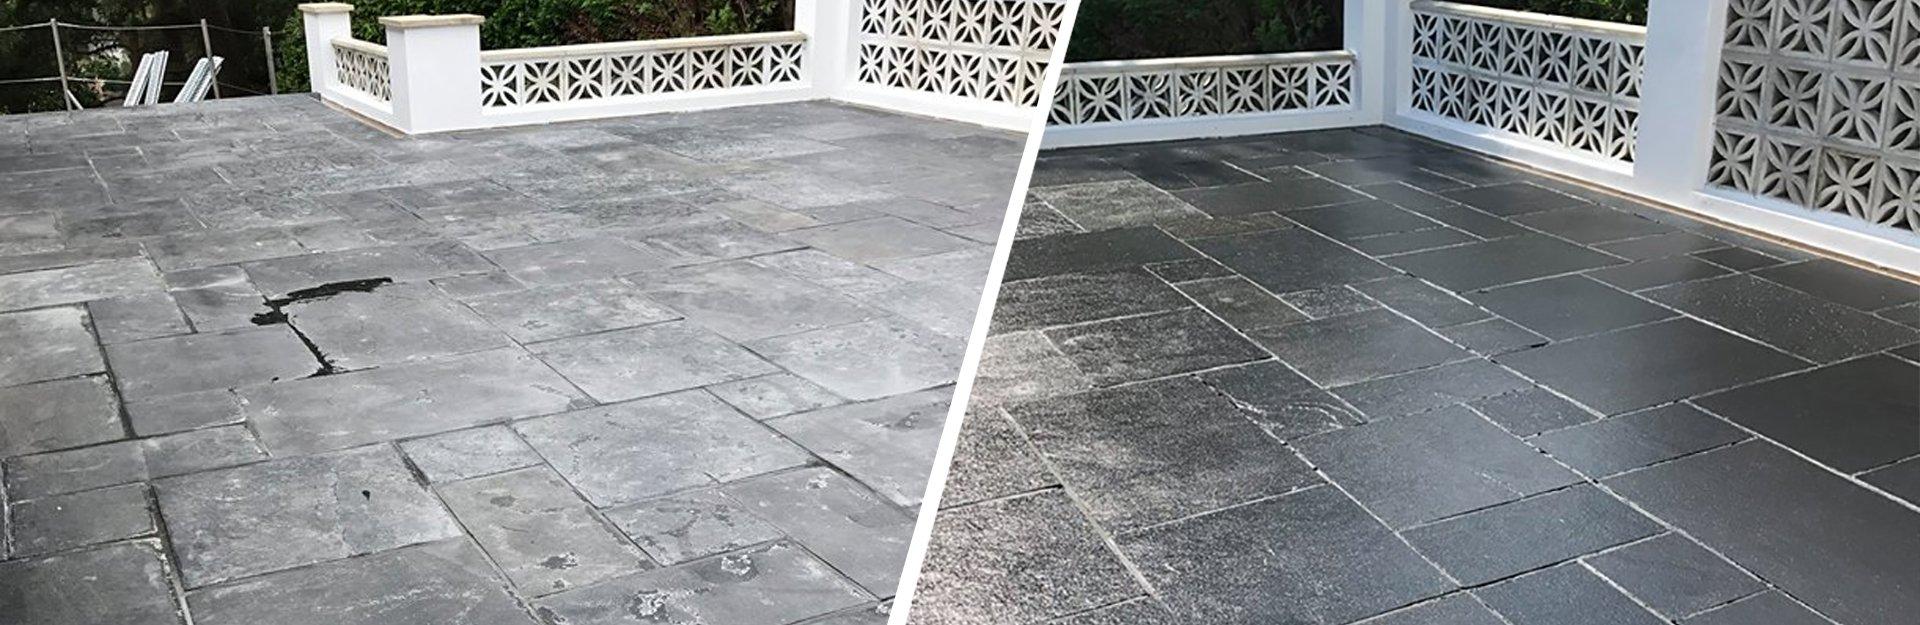 karndean stone knight vinyl oh portland flooring tile floor